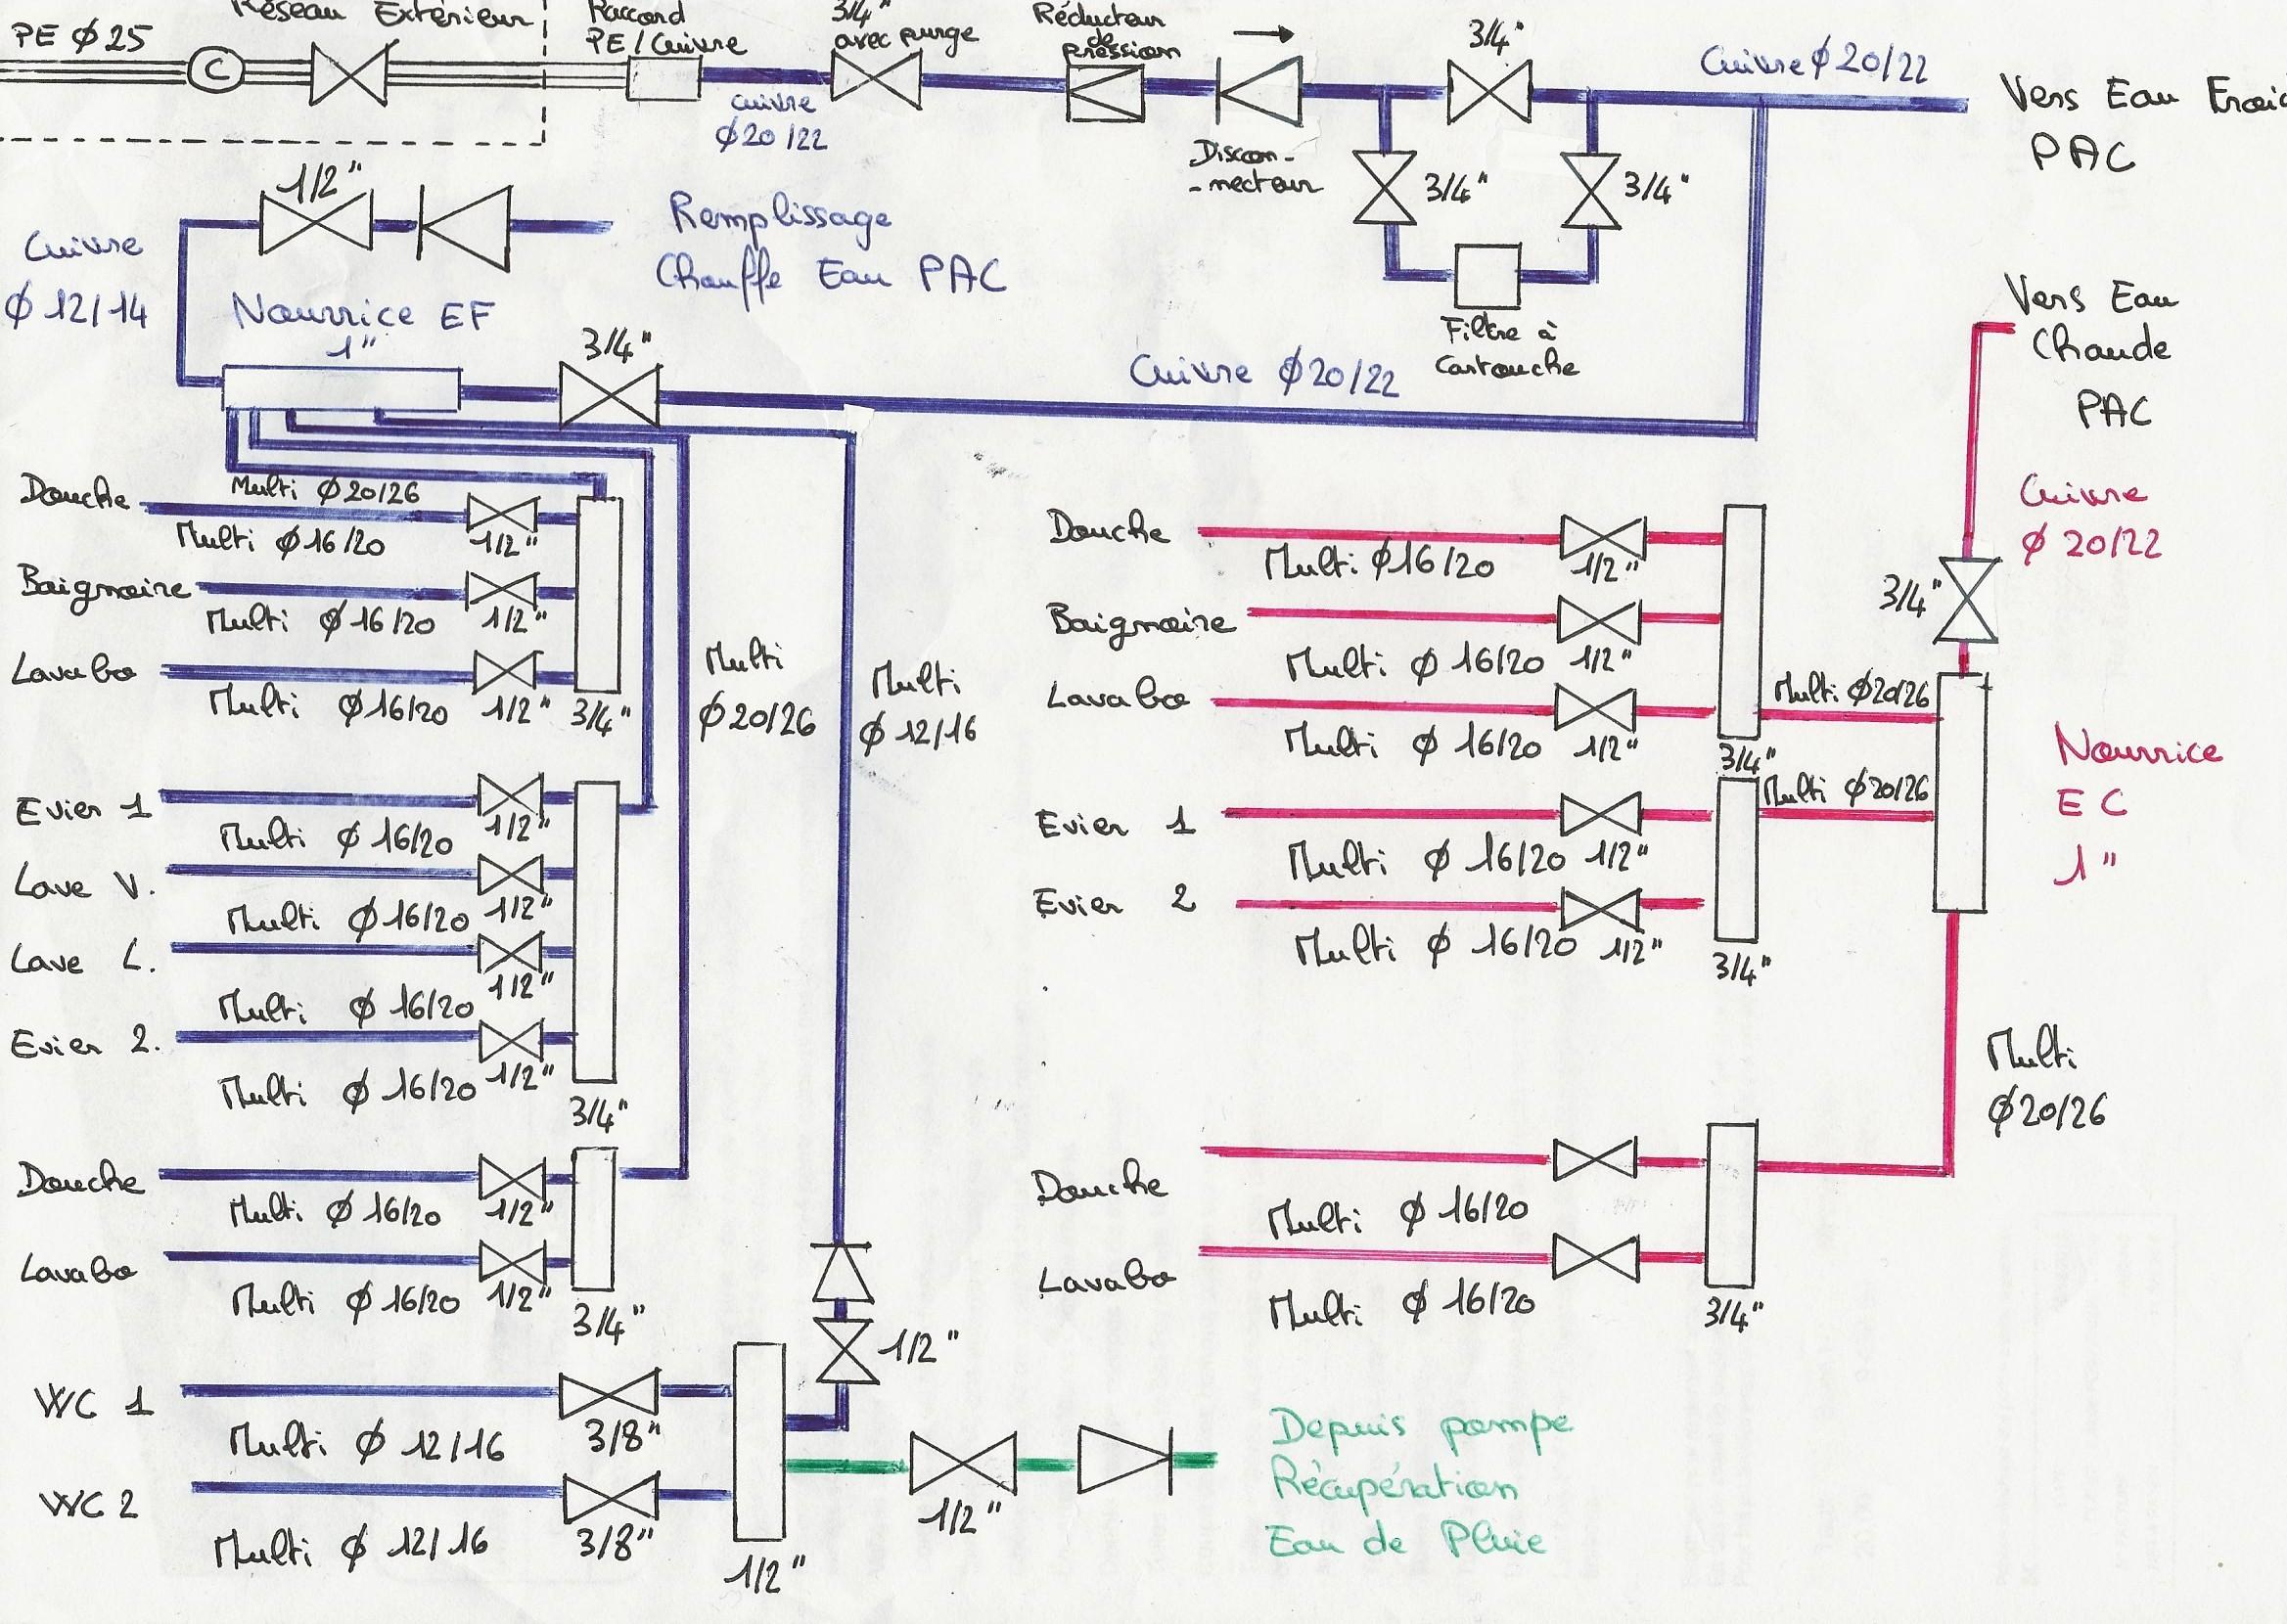 Plan plomberie - Edited.jpg, 863.36 kb, 2337 x 1660